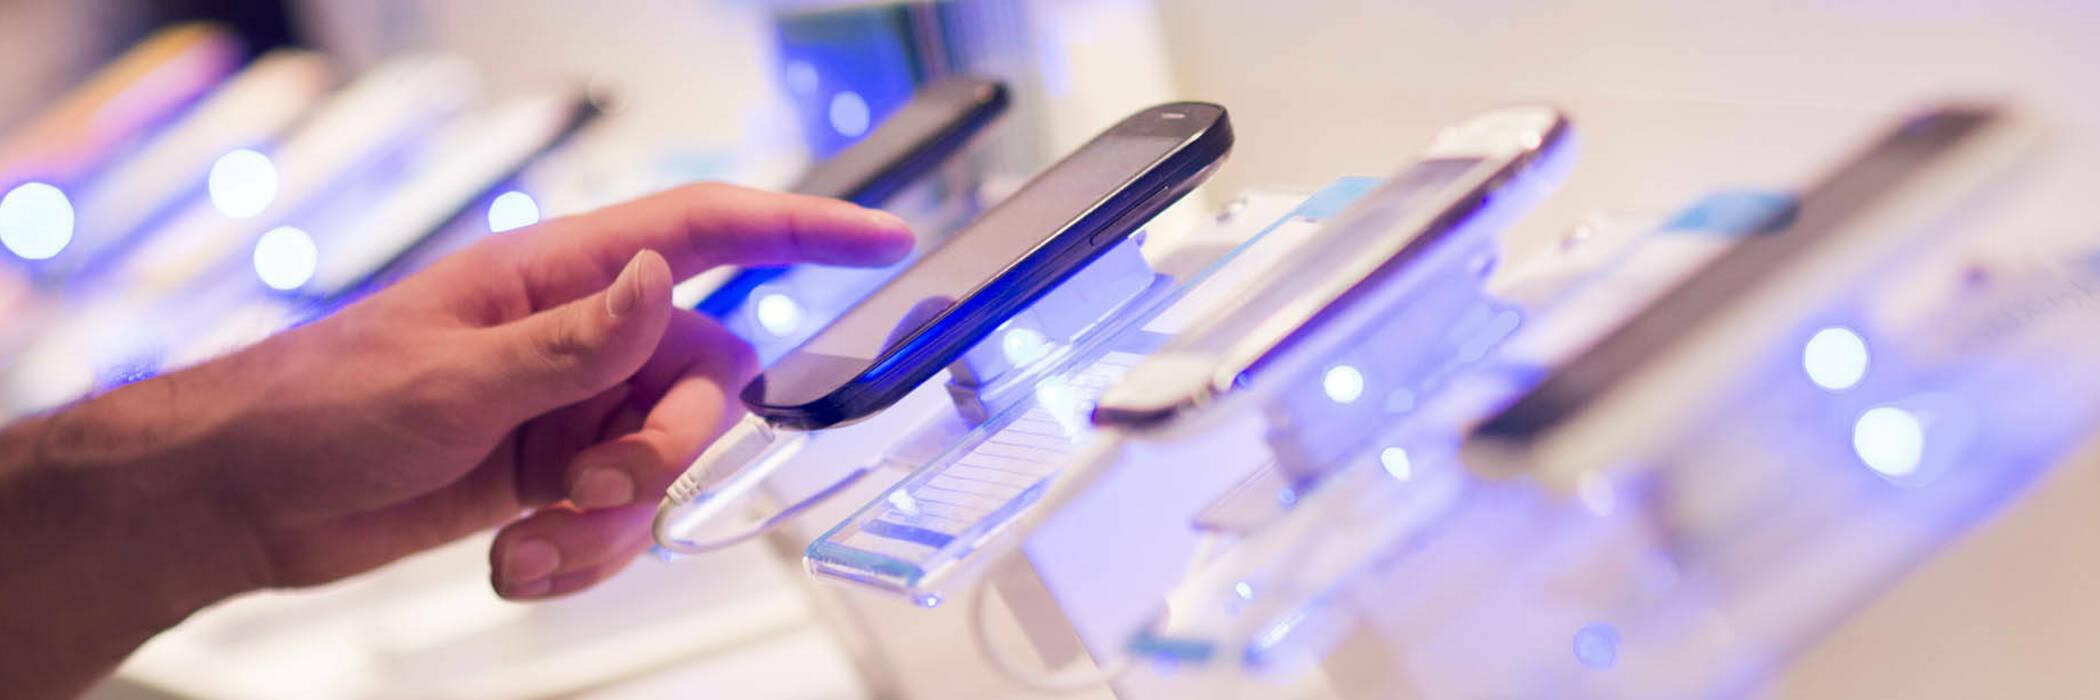 20jun electronics retailer warned hero